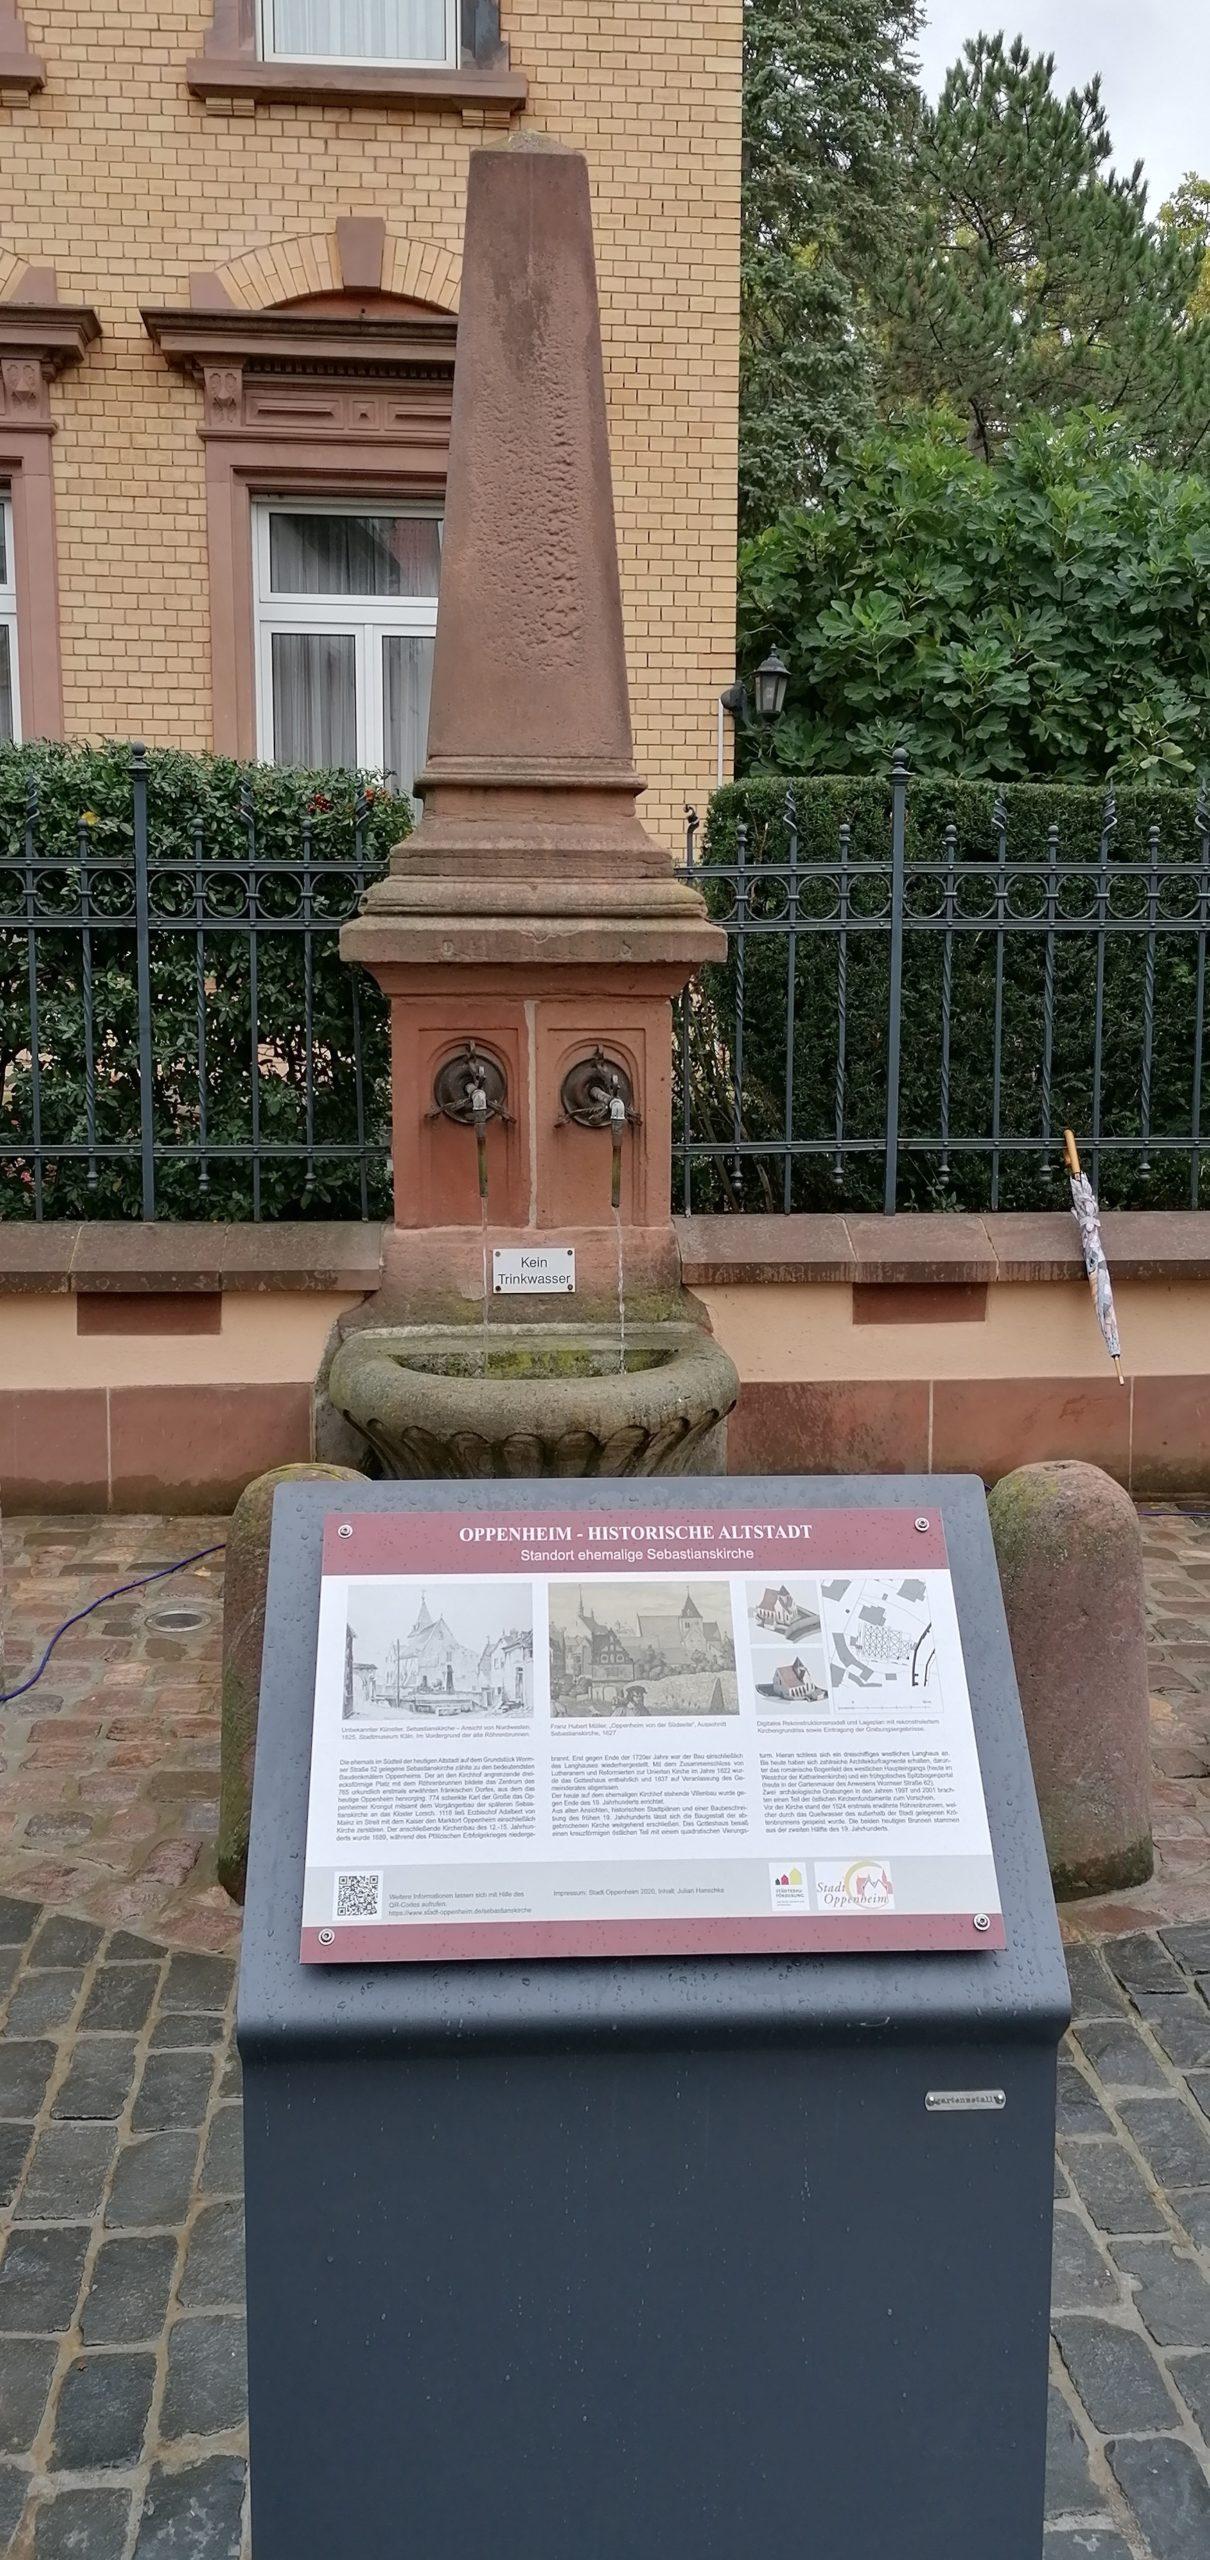 Eröffnung Röhrenbrunnenplatz